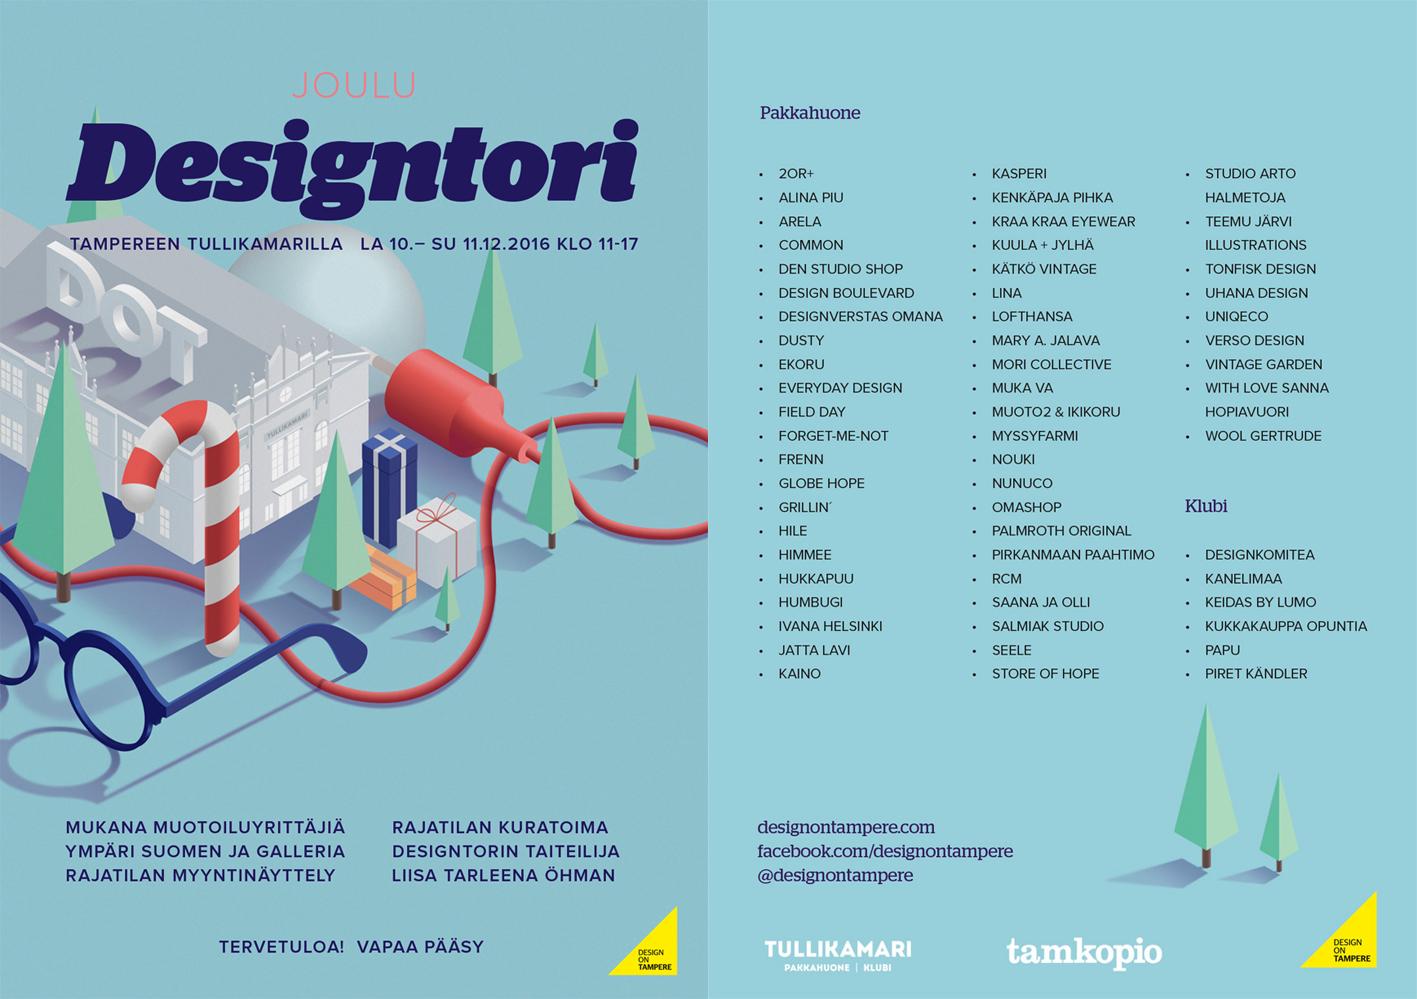 Designtori joulu tapahtuma 10.-11.12.2016 Tampere Design Boulevard mukana torilla